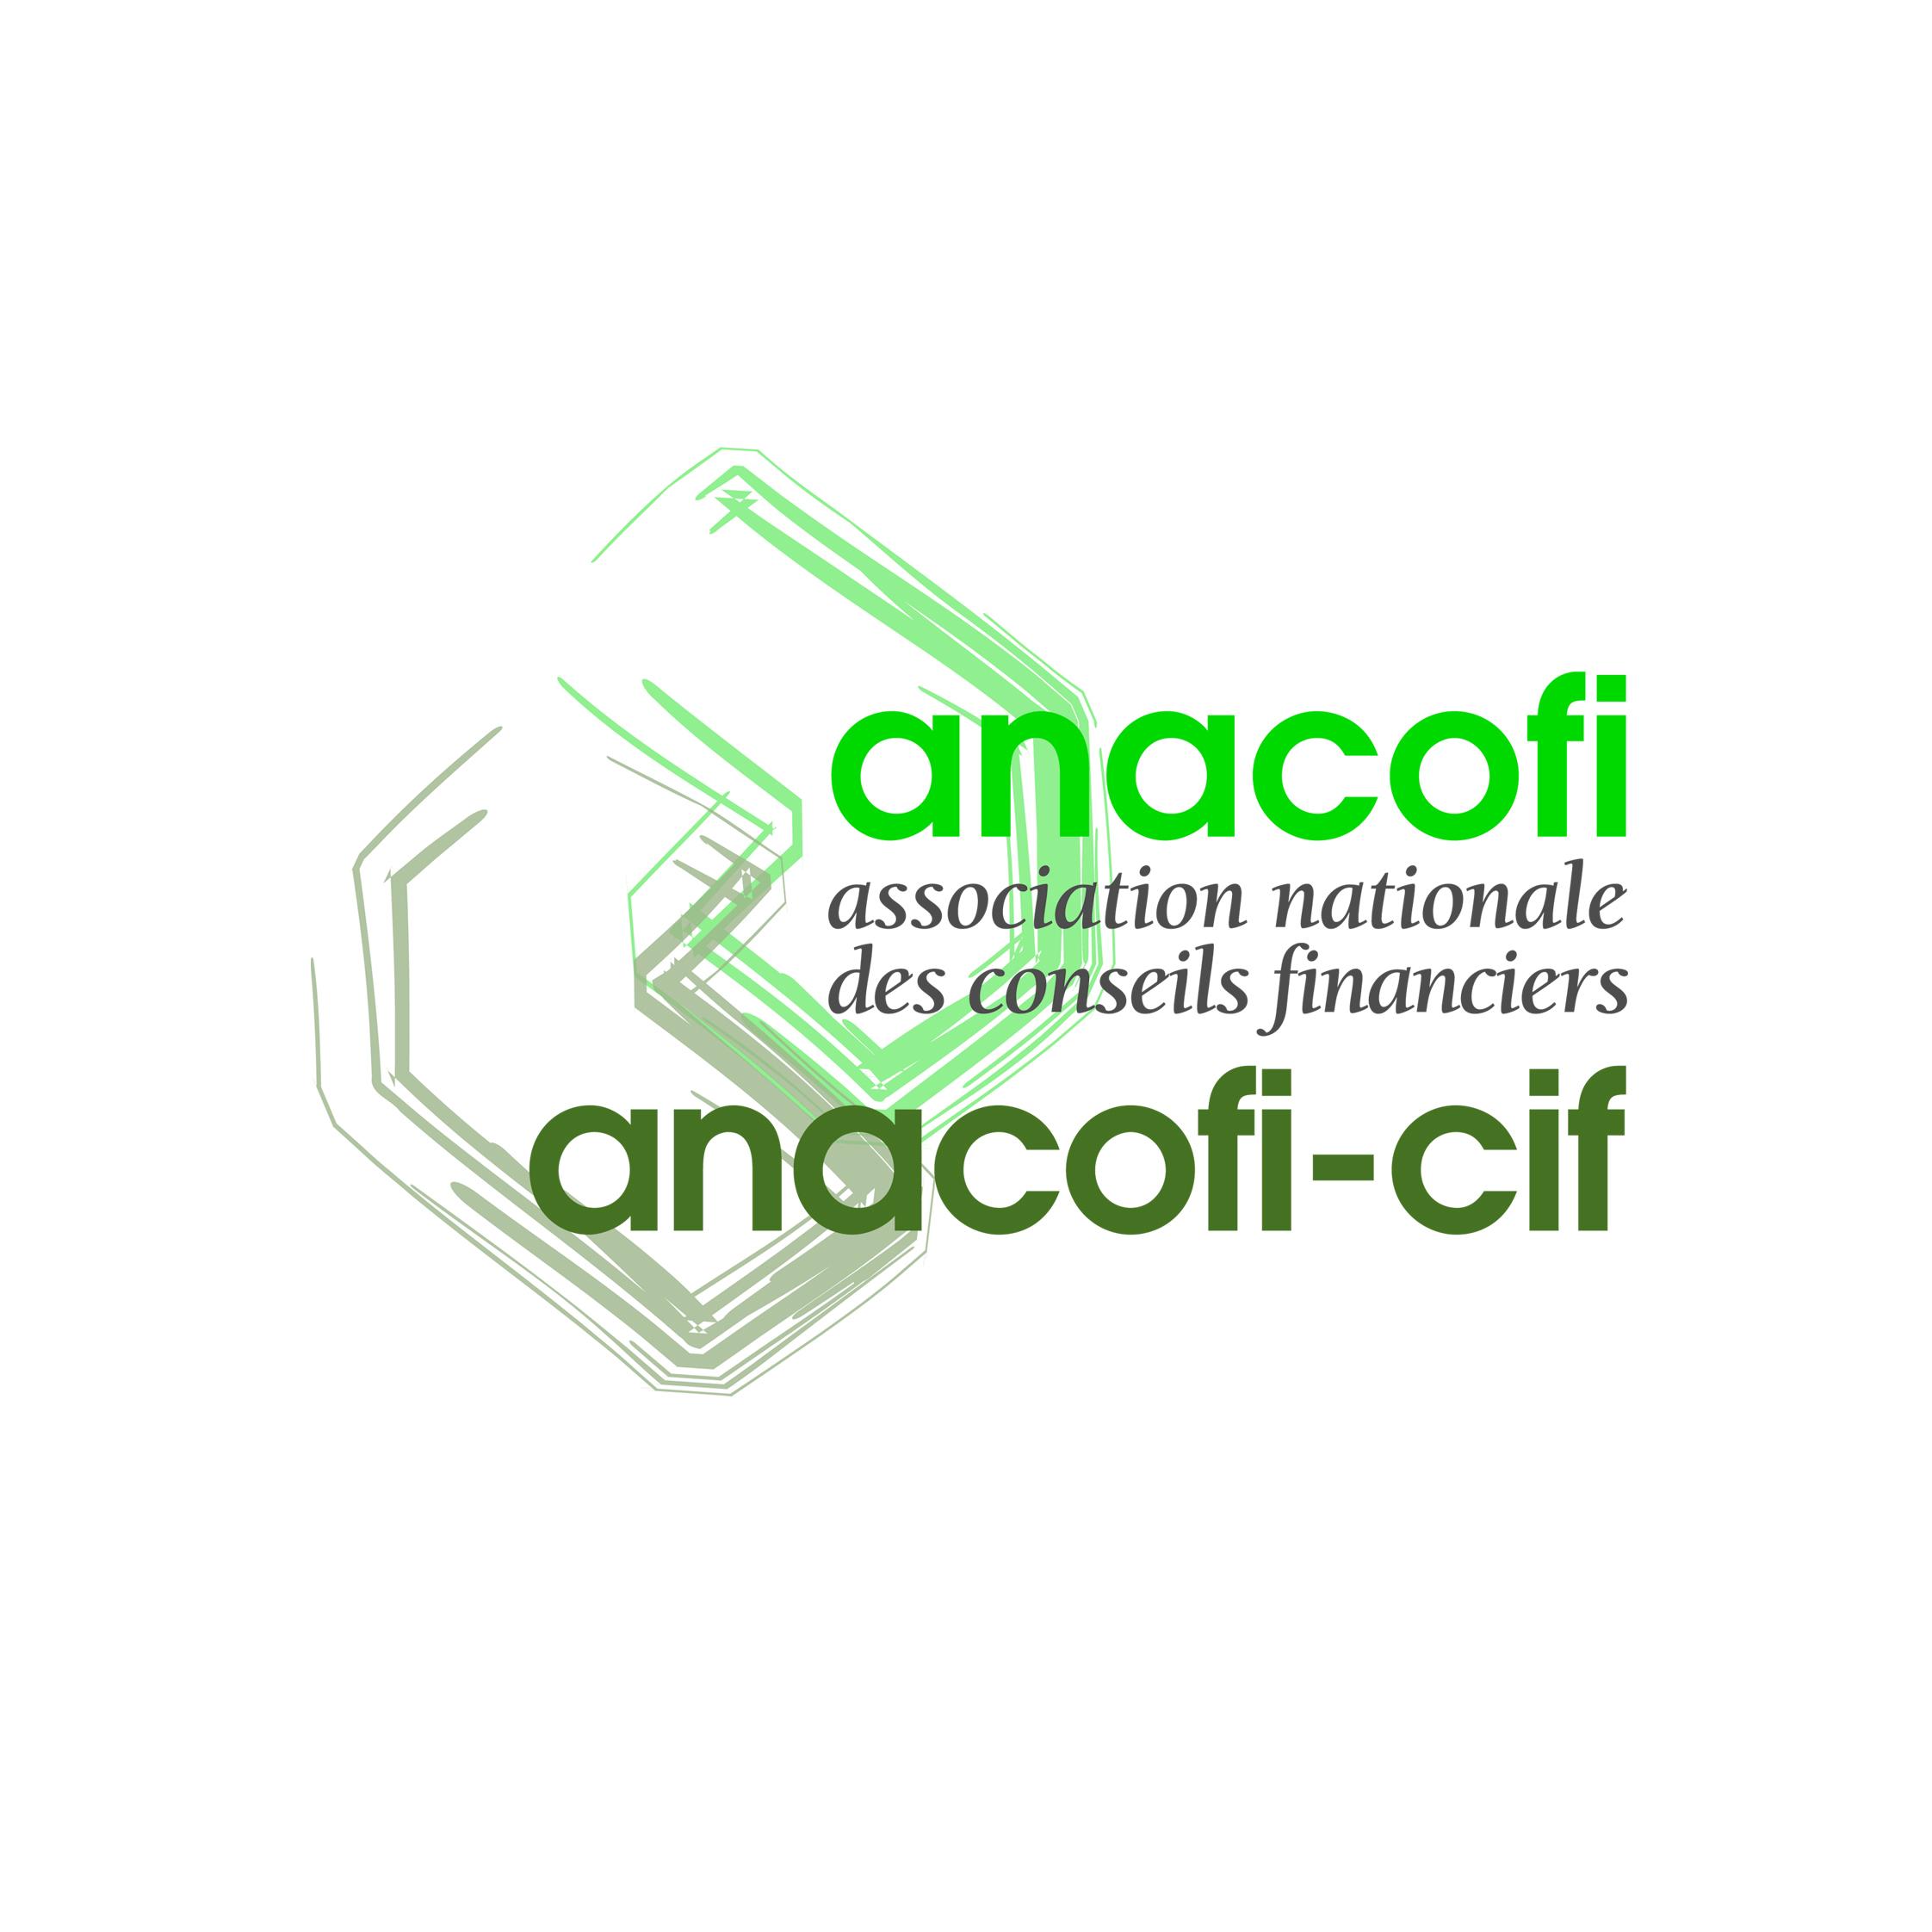 logo anacofi-cif CM#23AEDF2